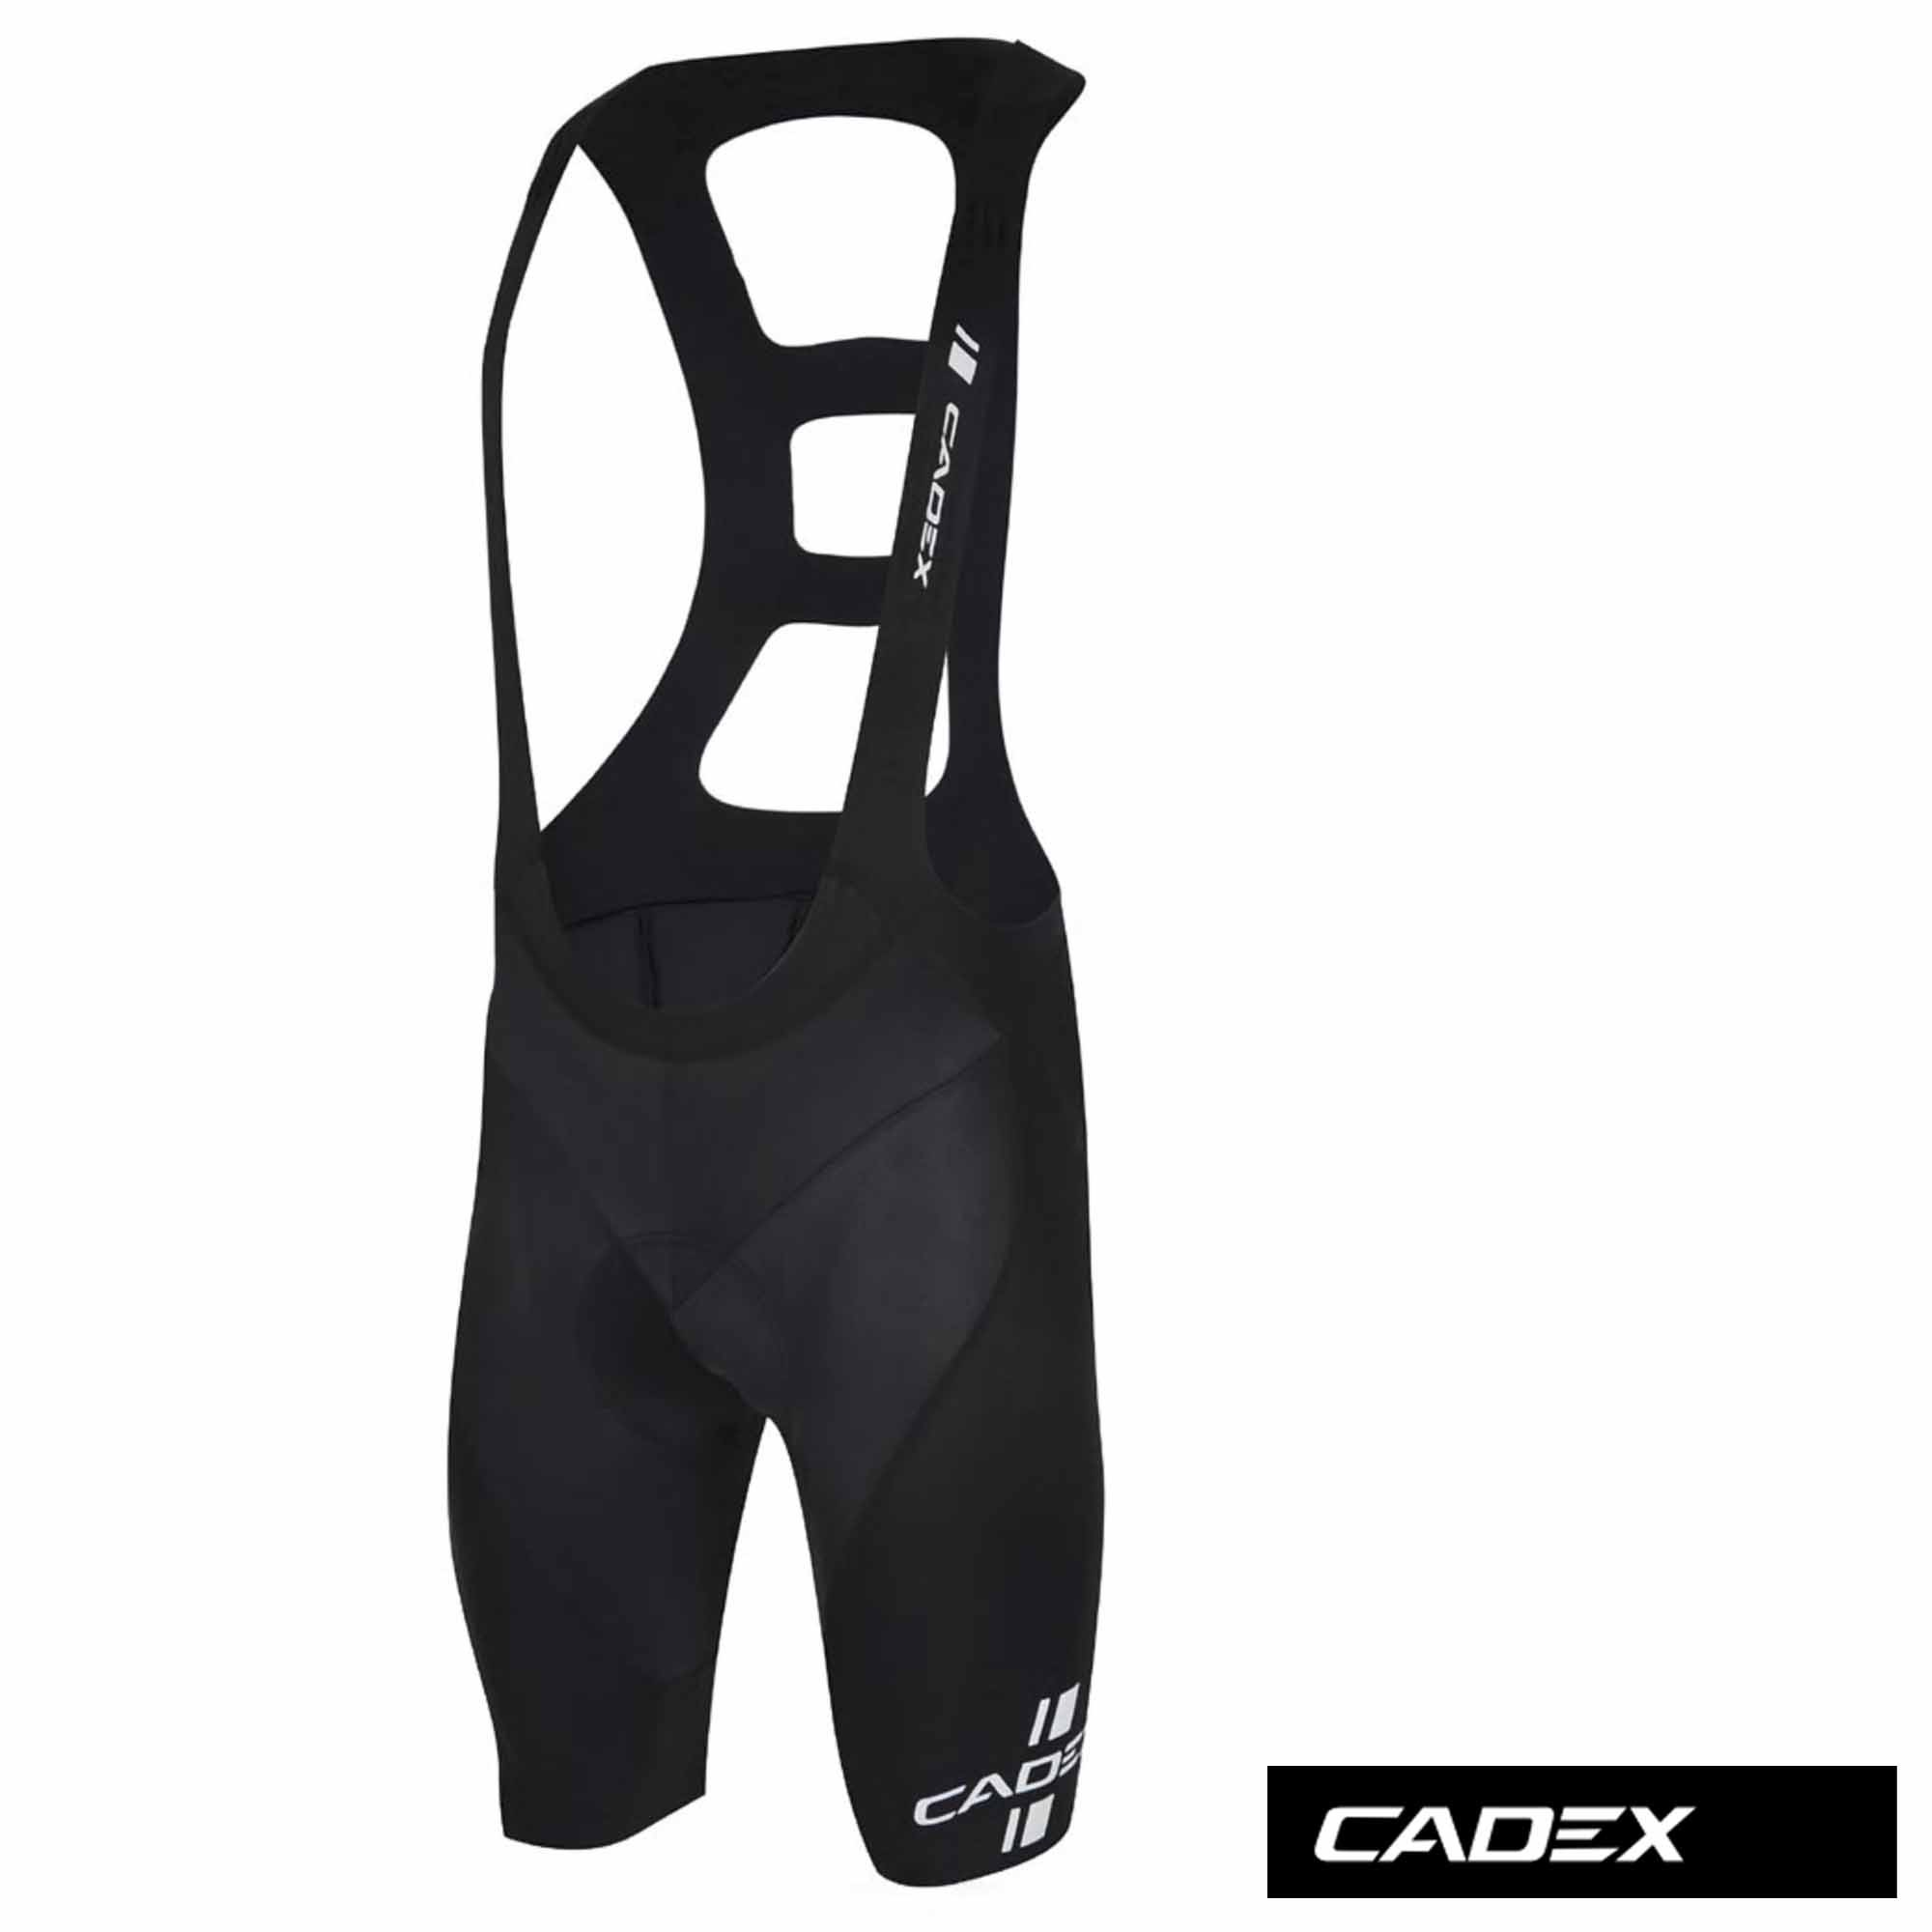 Cuissard CADEX confort